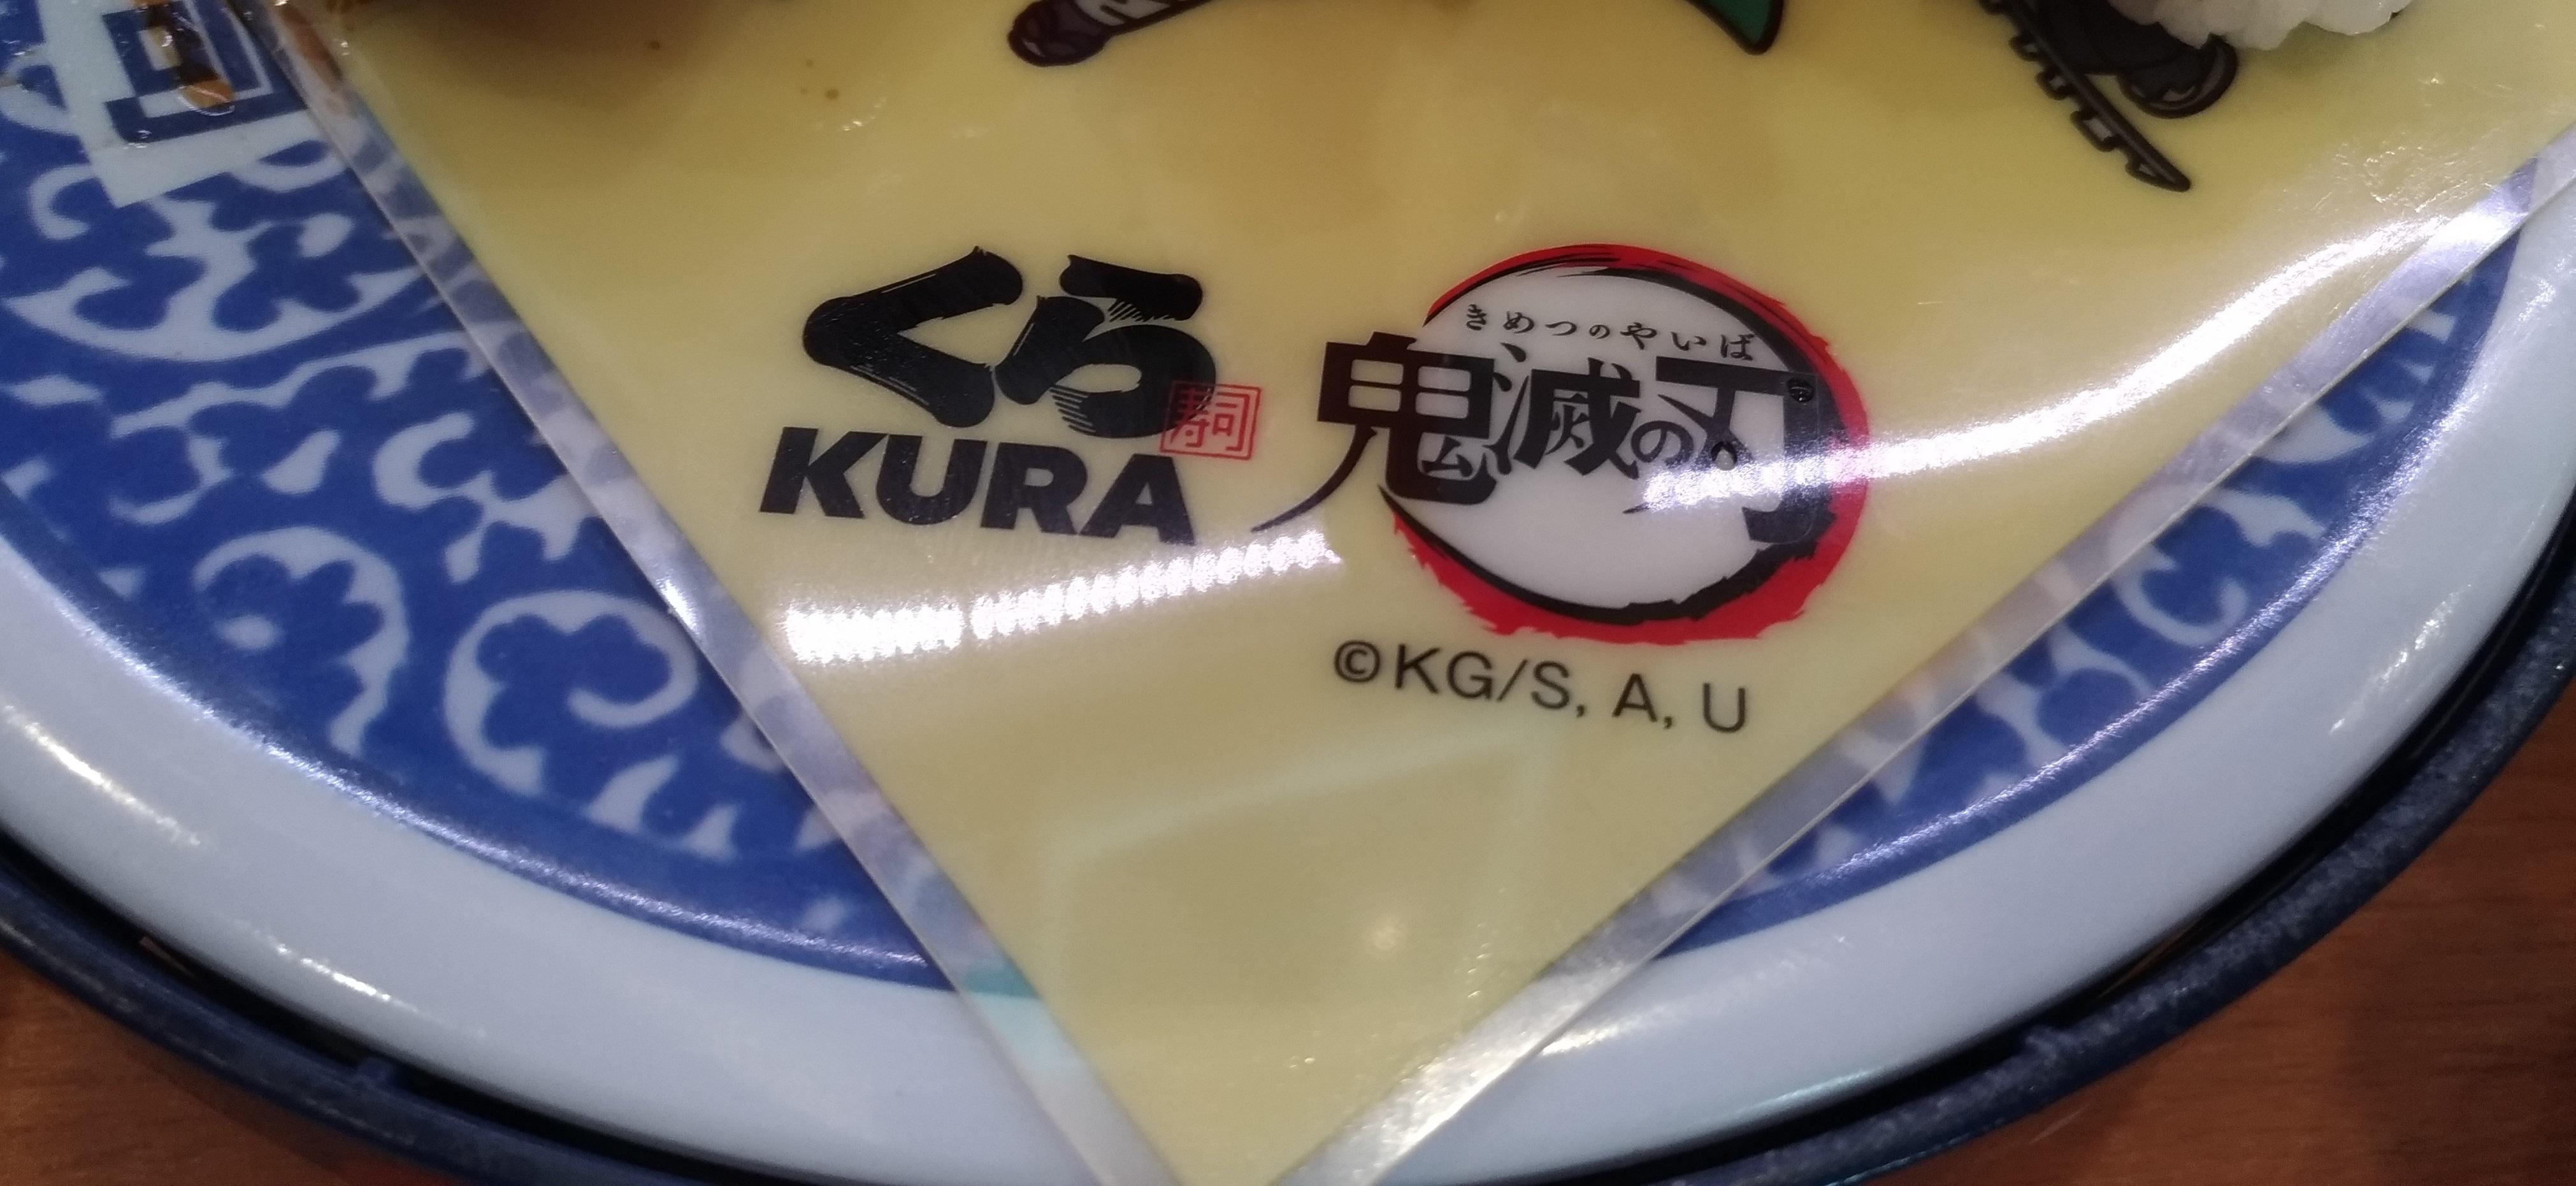 kimetsu_kura_corabo_202009_13_.jpg